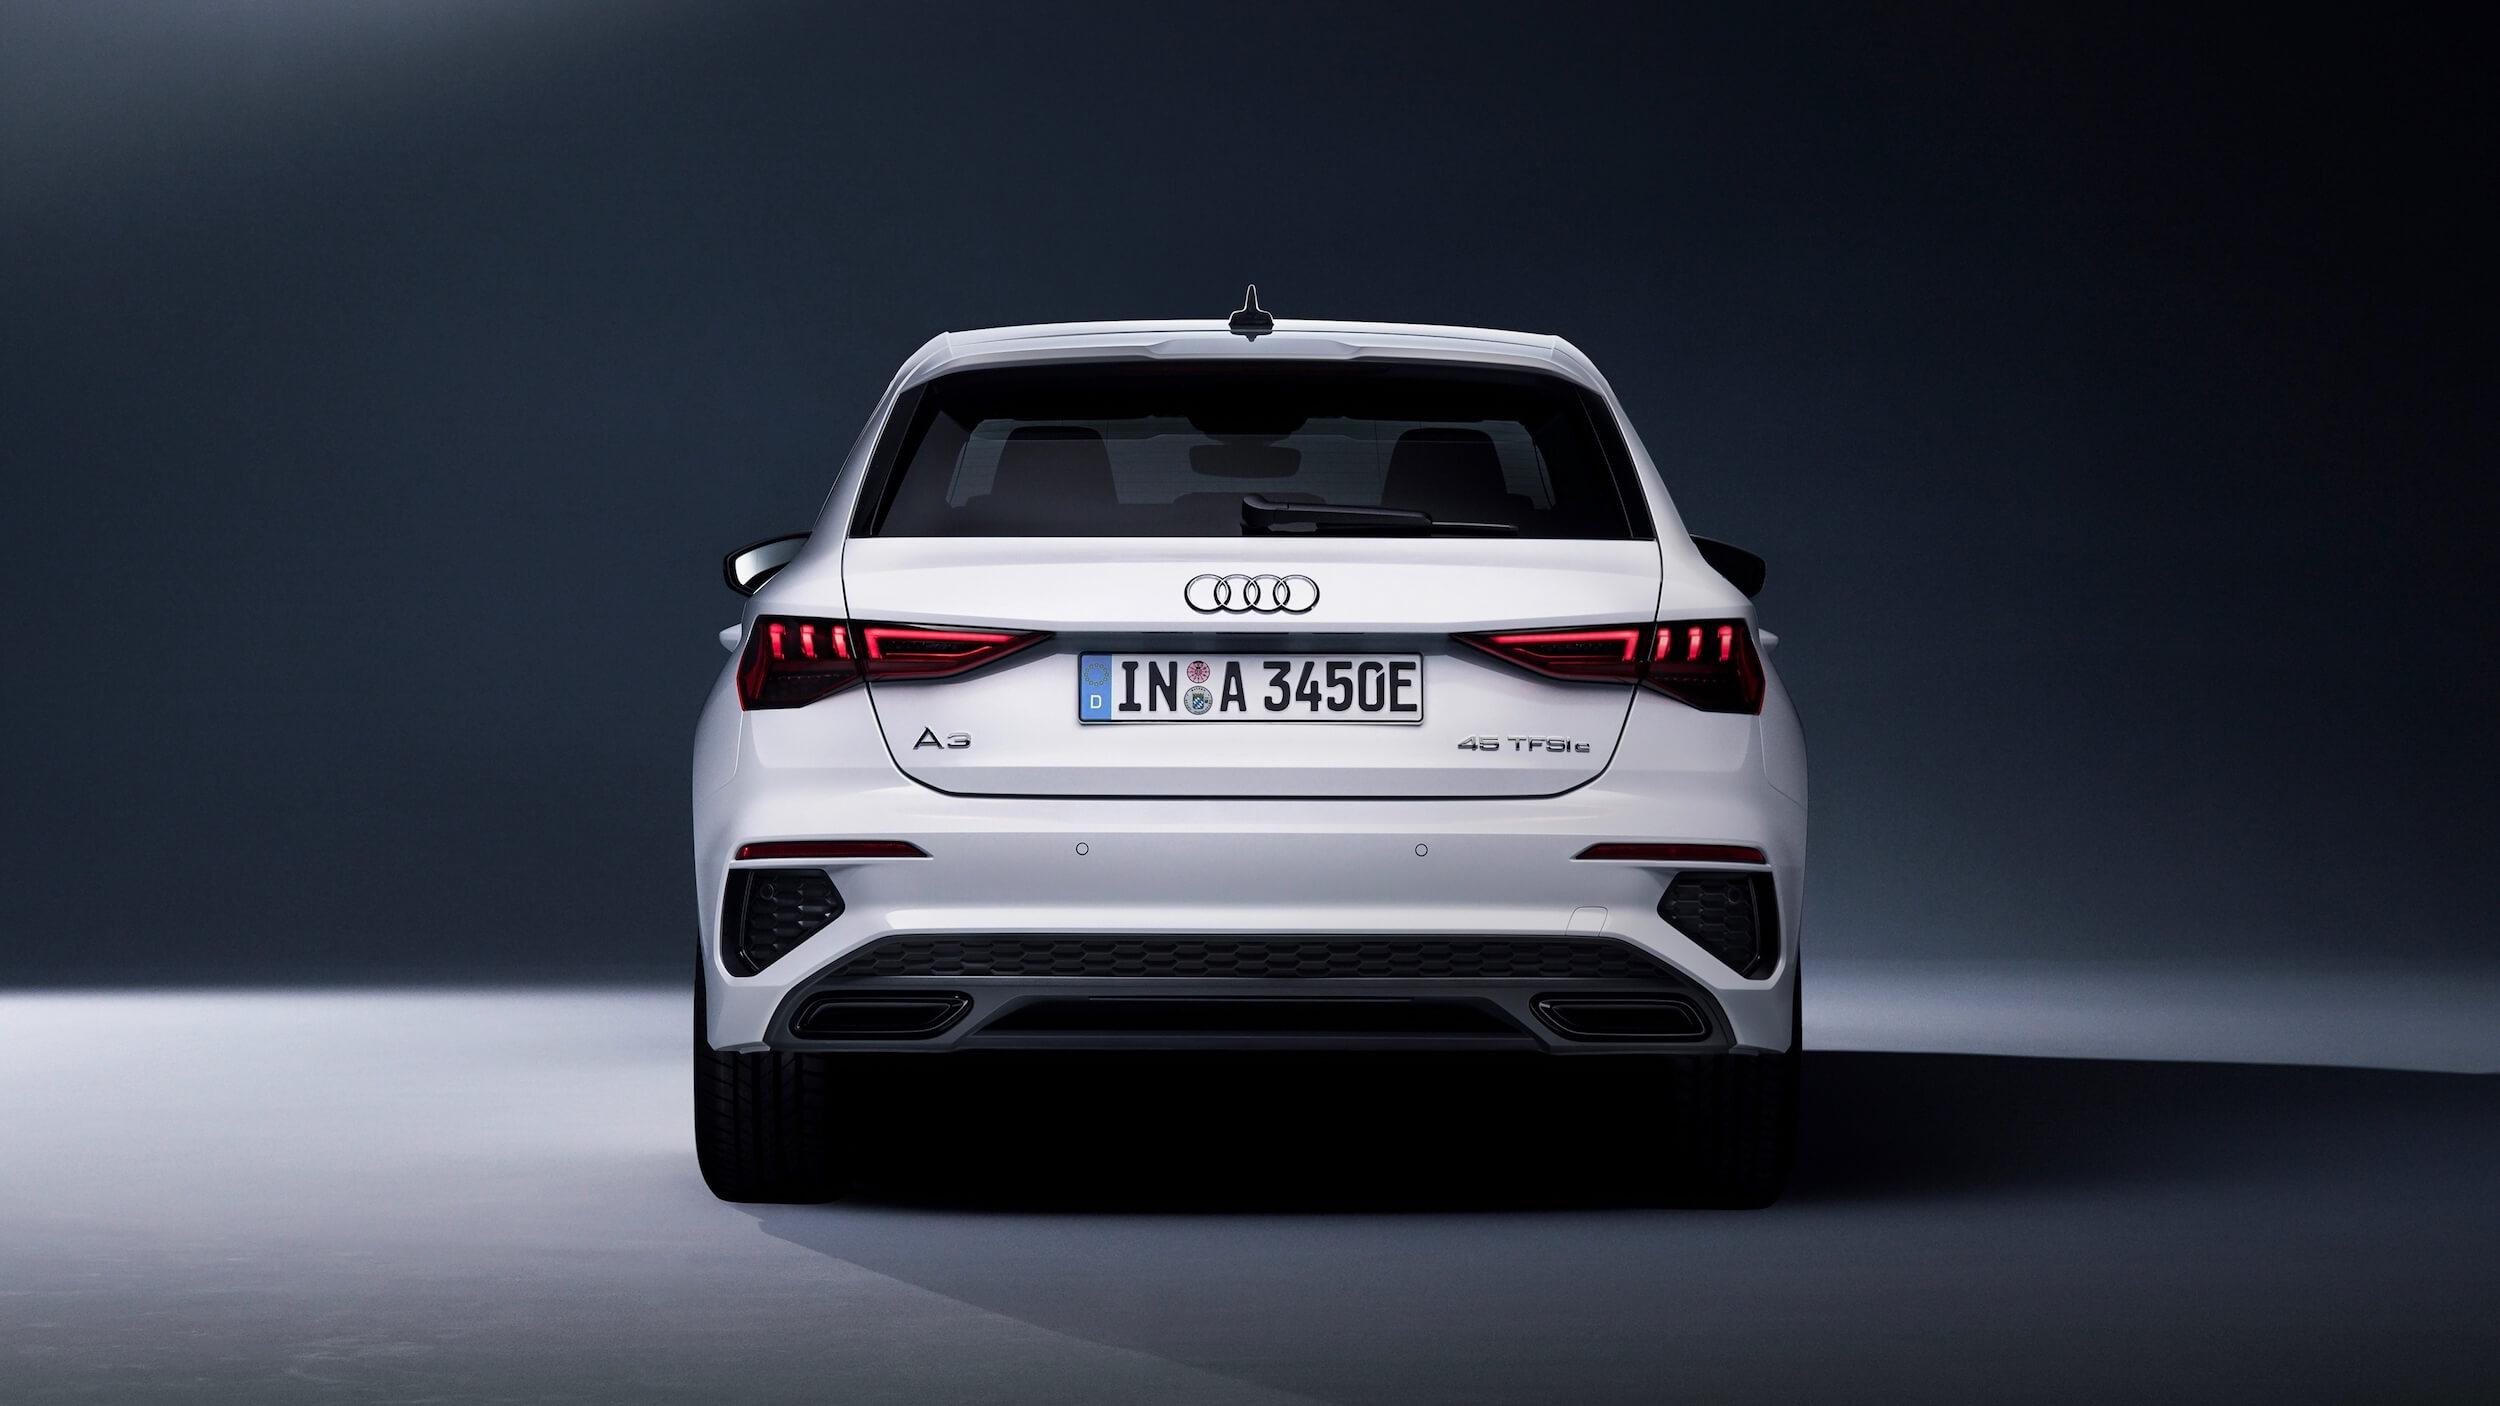 Audi A3 Sportback 45 TFSIe achterkant